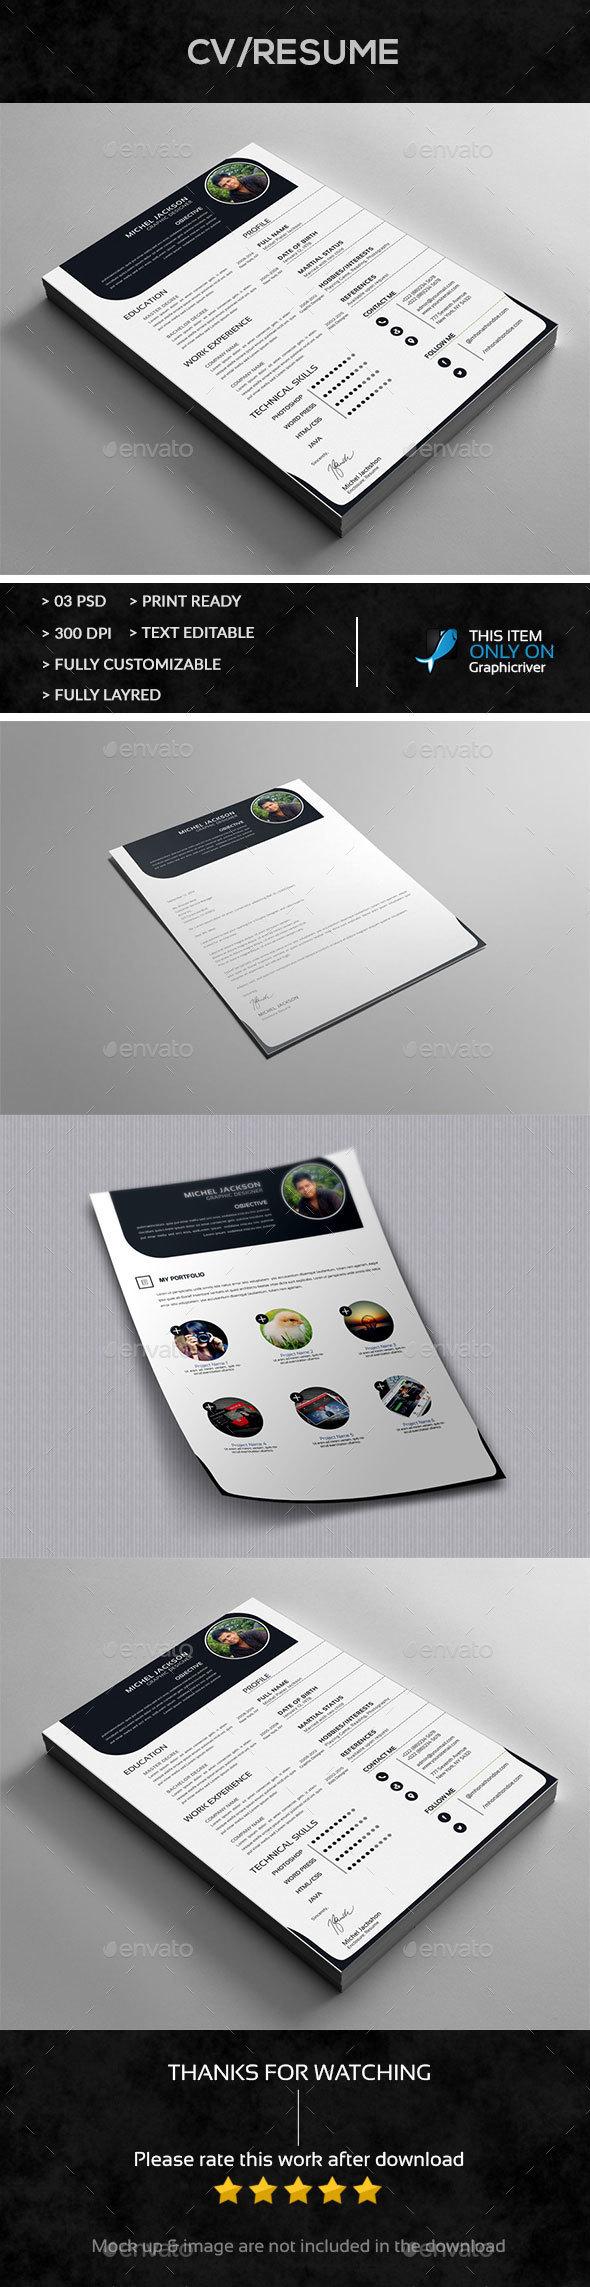 Resume + Cover Letter + Portfolio